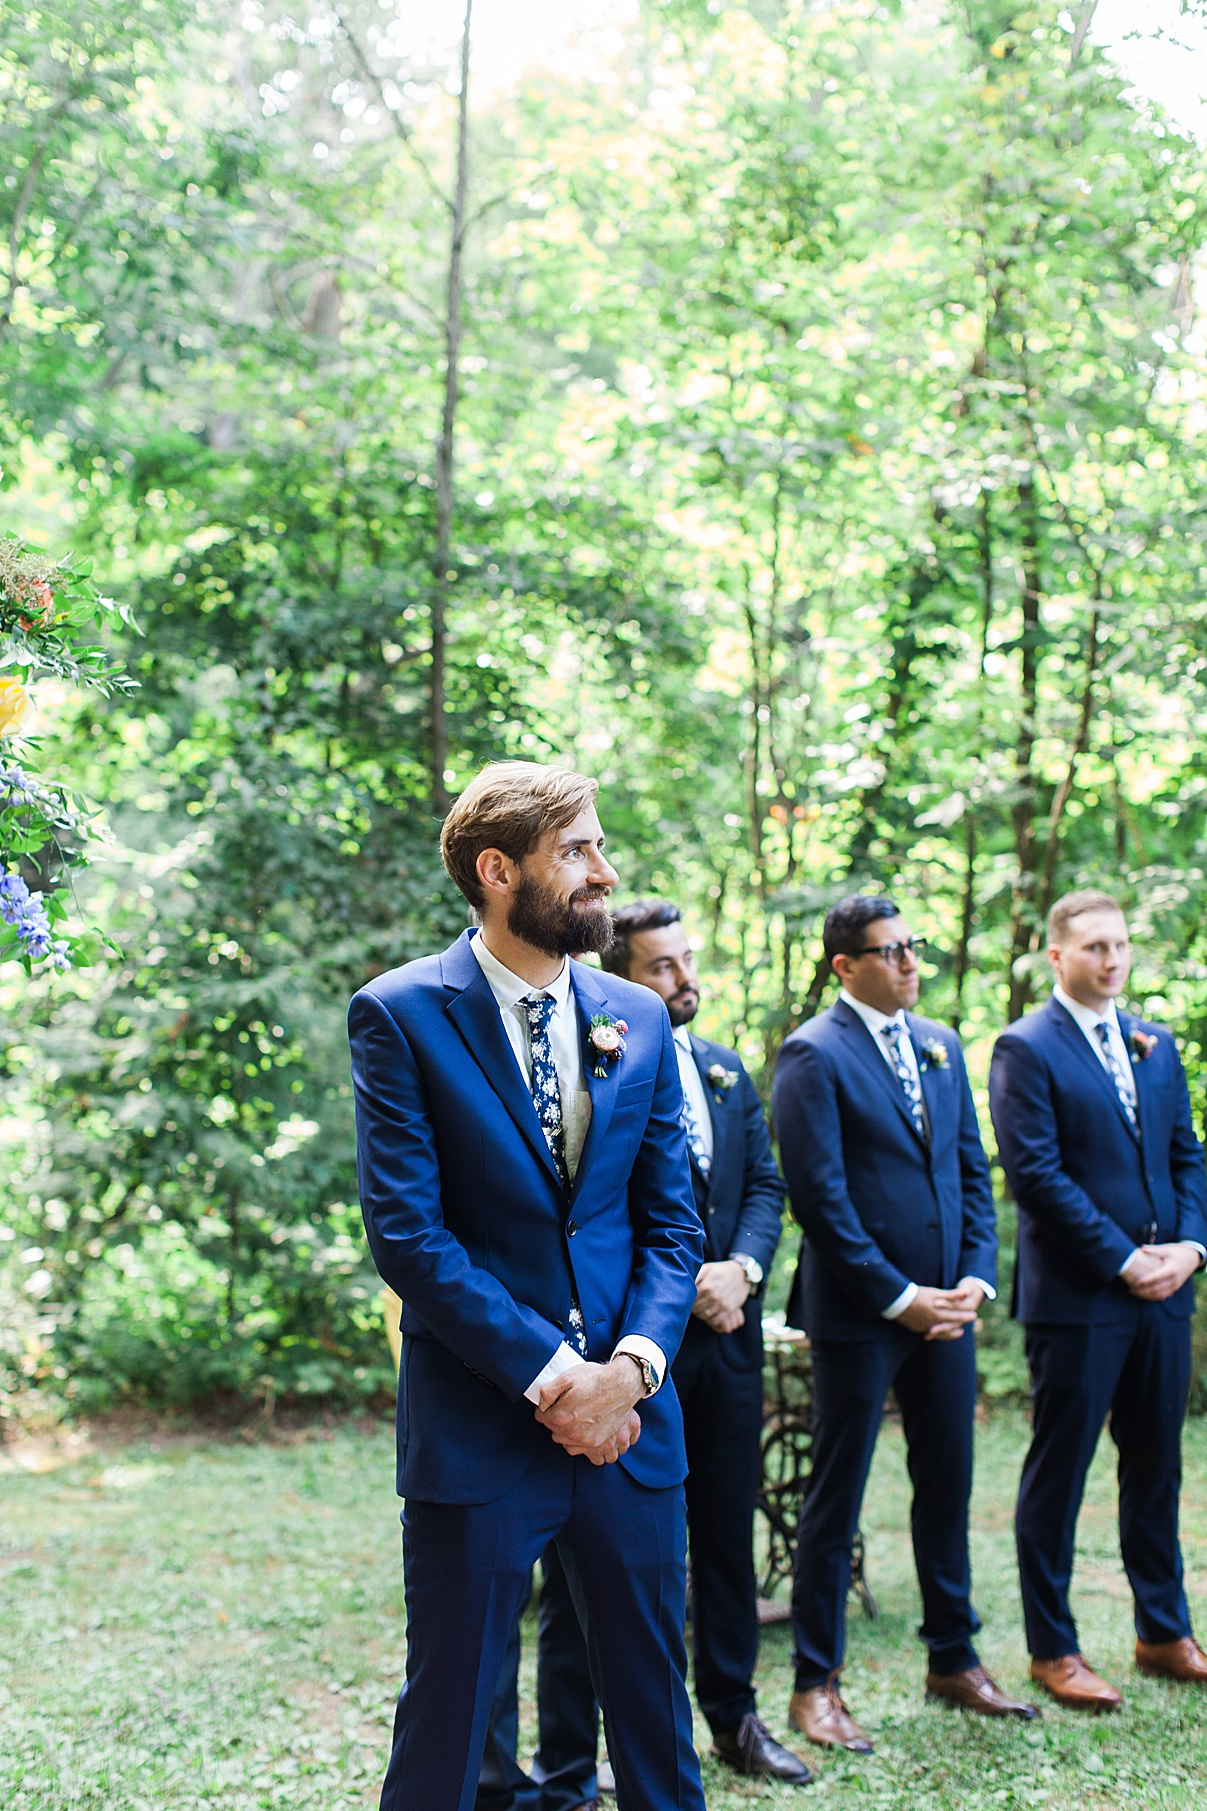 Groom smiling at alter | Balls Falls, Ontario Wedding| Ontario Wedding Photographer| Toronto Wedding Photographer| 3Photography|3photography.ca 040